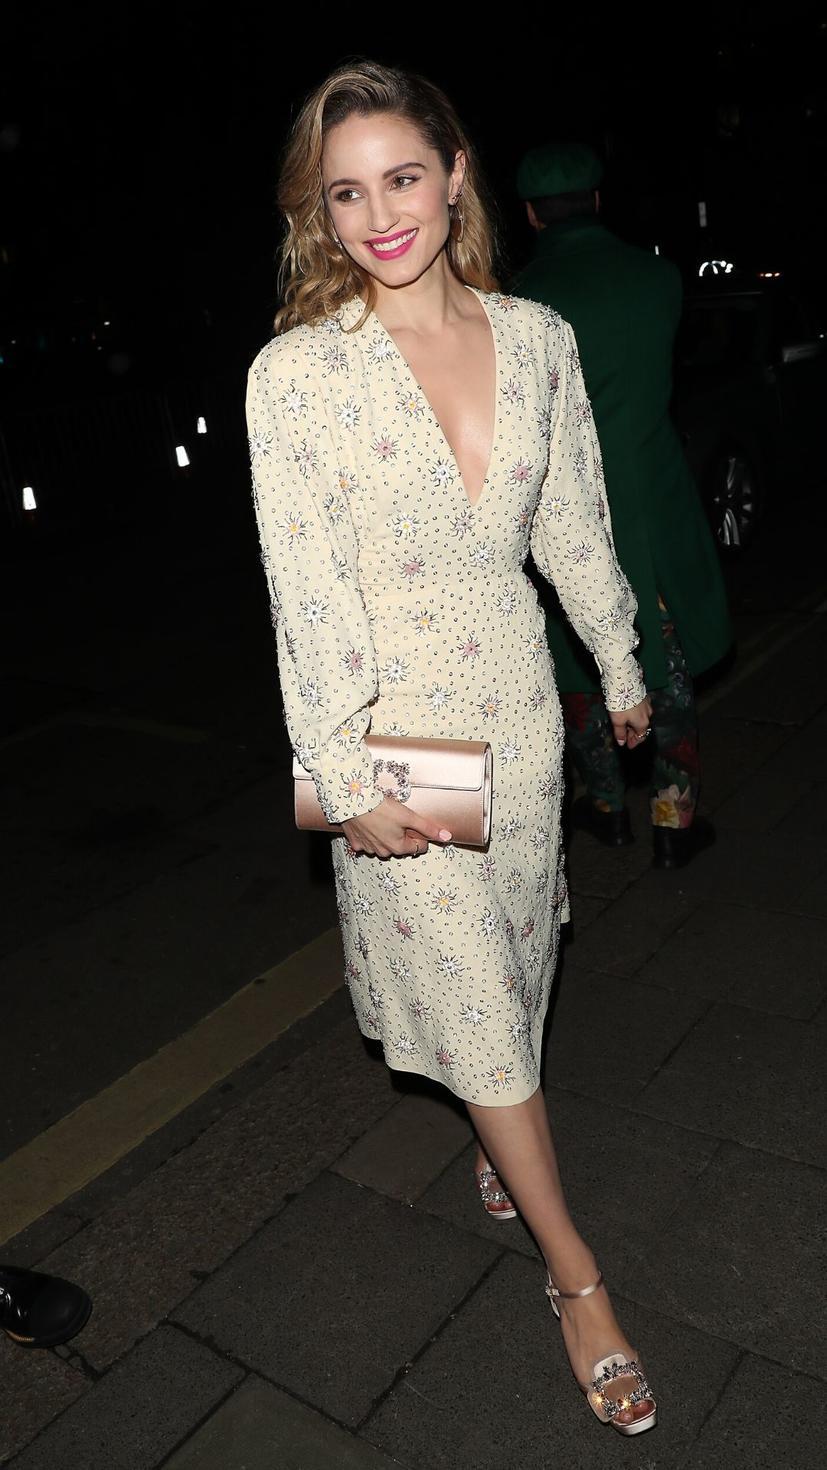 Dianna Agron wears a Miu Miu RS20 dress, a Roger Vivier clutch and platform pumps